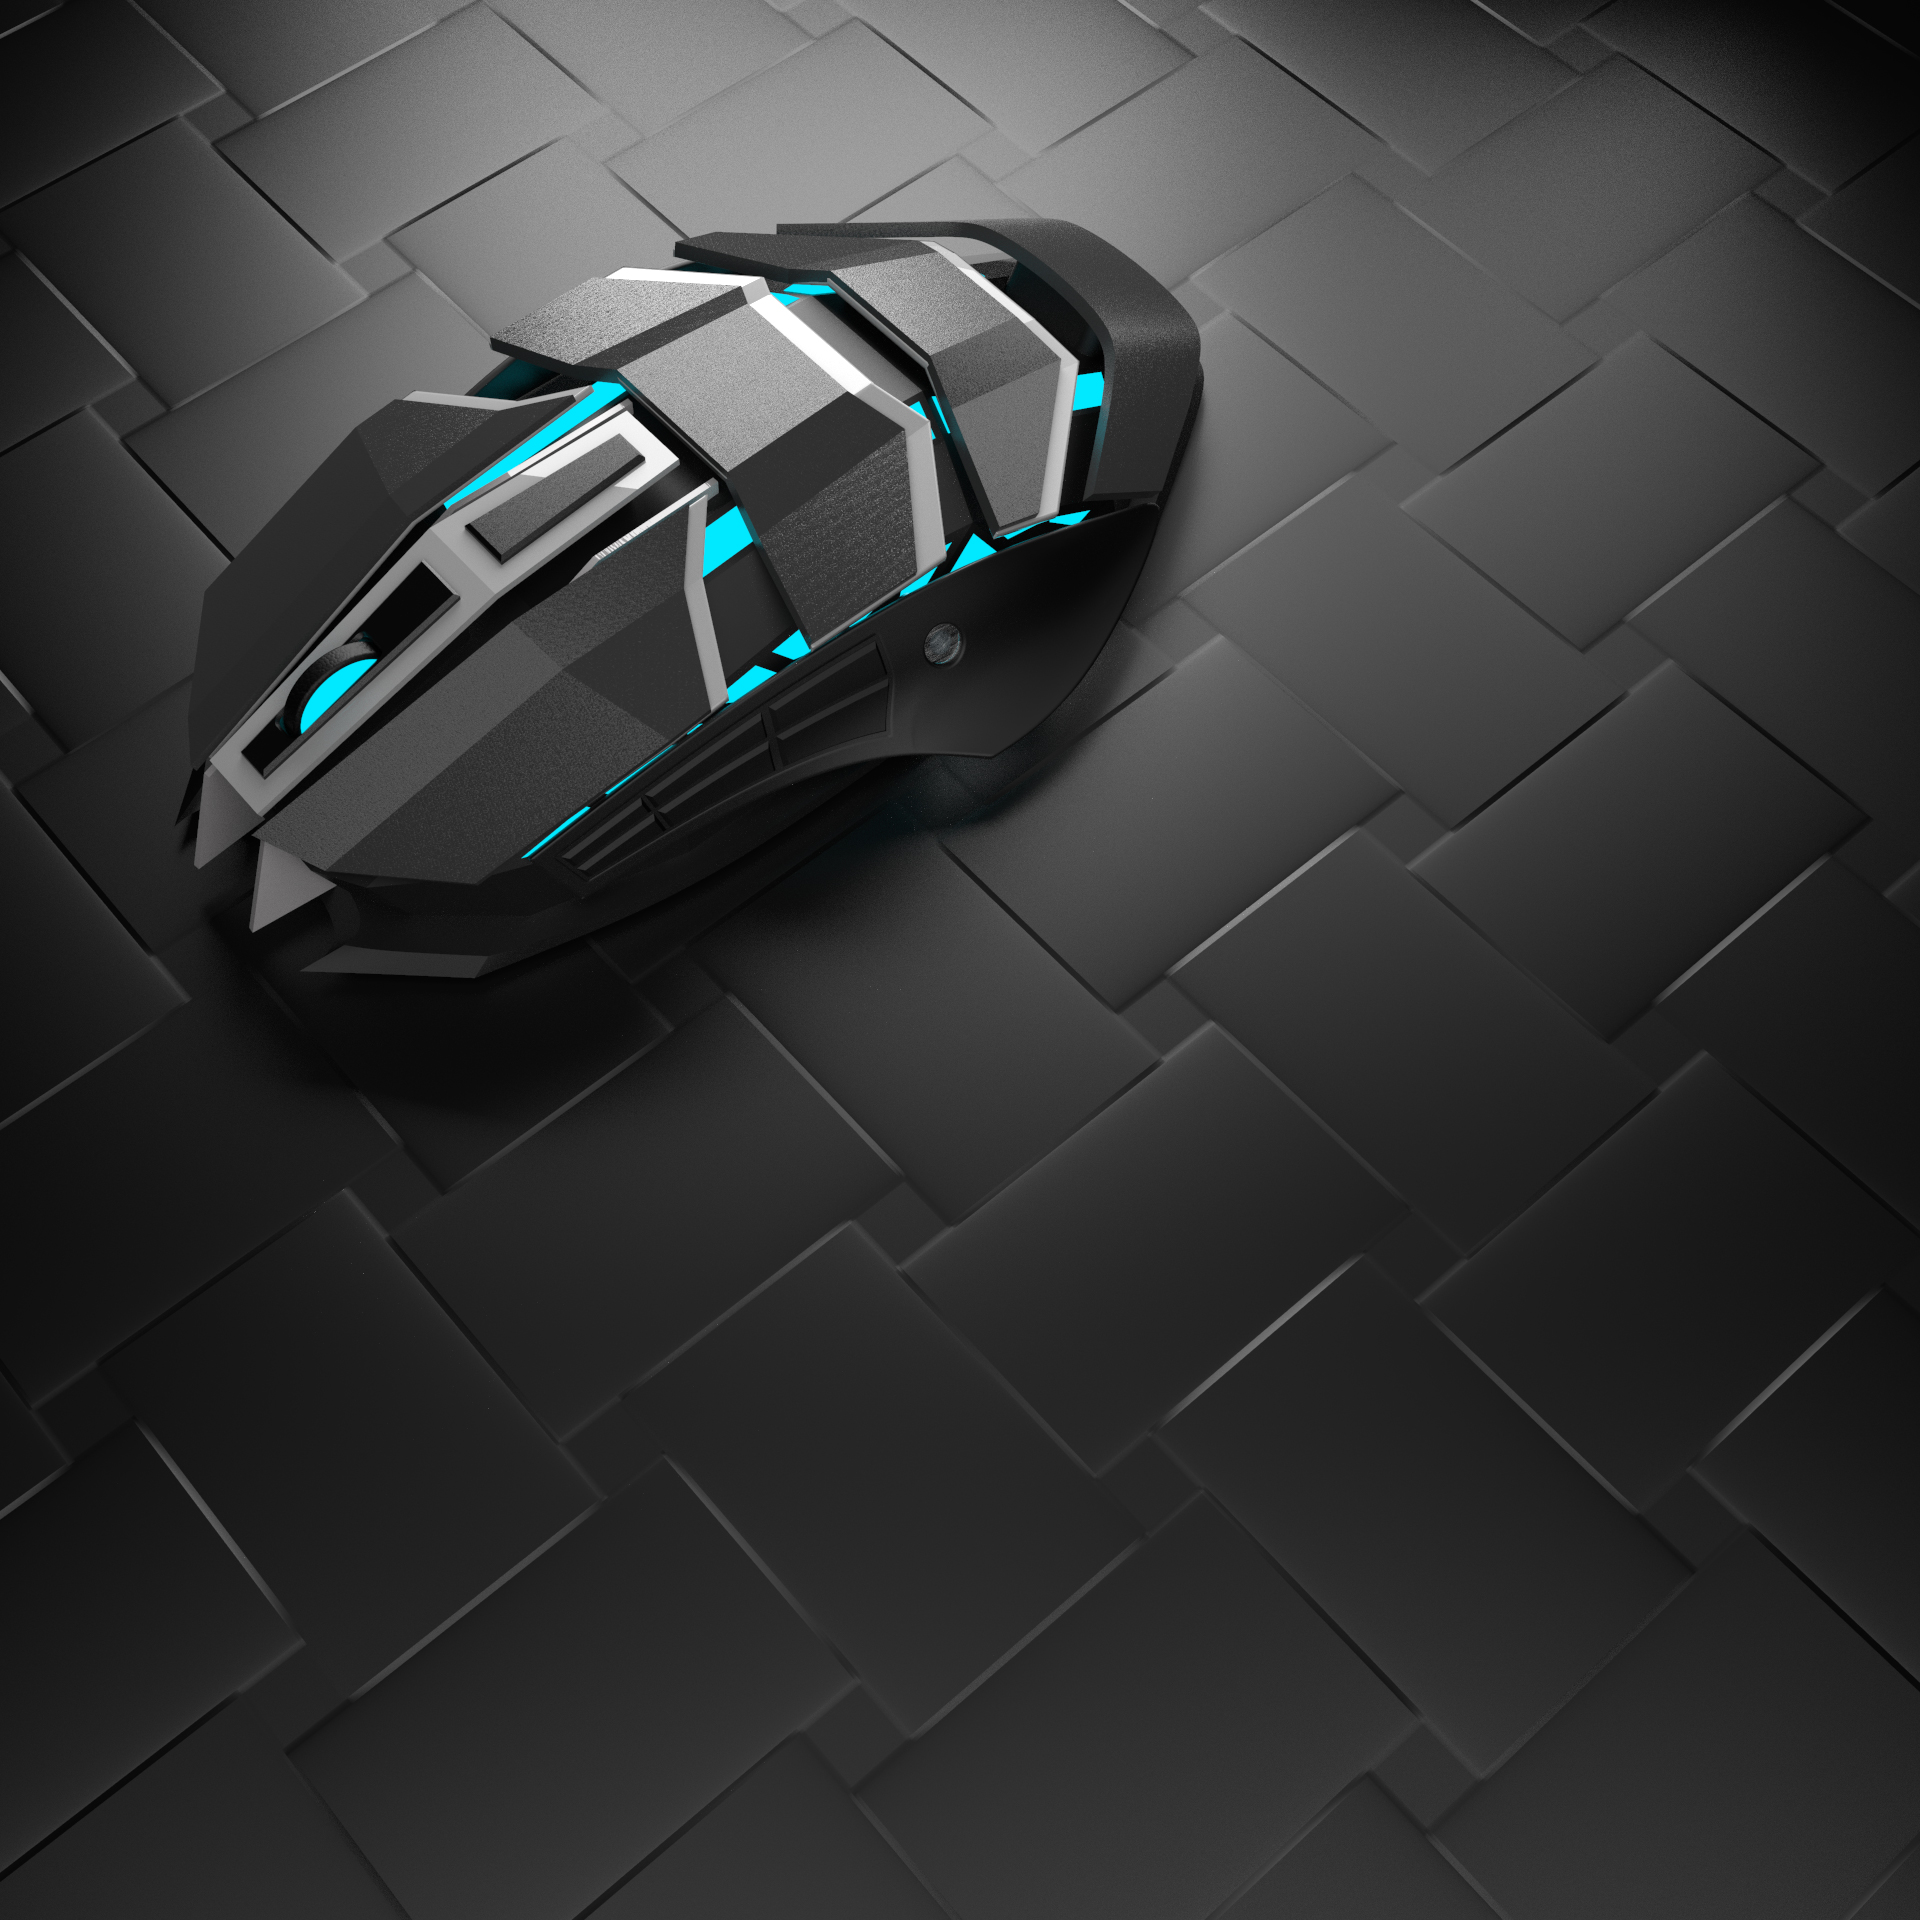 grabcad-stratasys-keyshot-gaming-mouse-dhimas-adi-render-00-sq